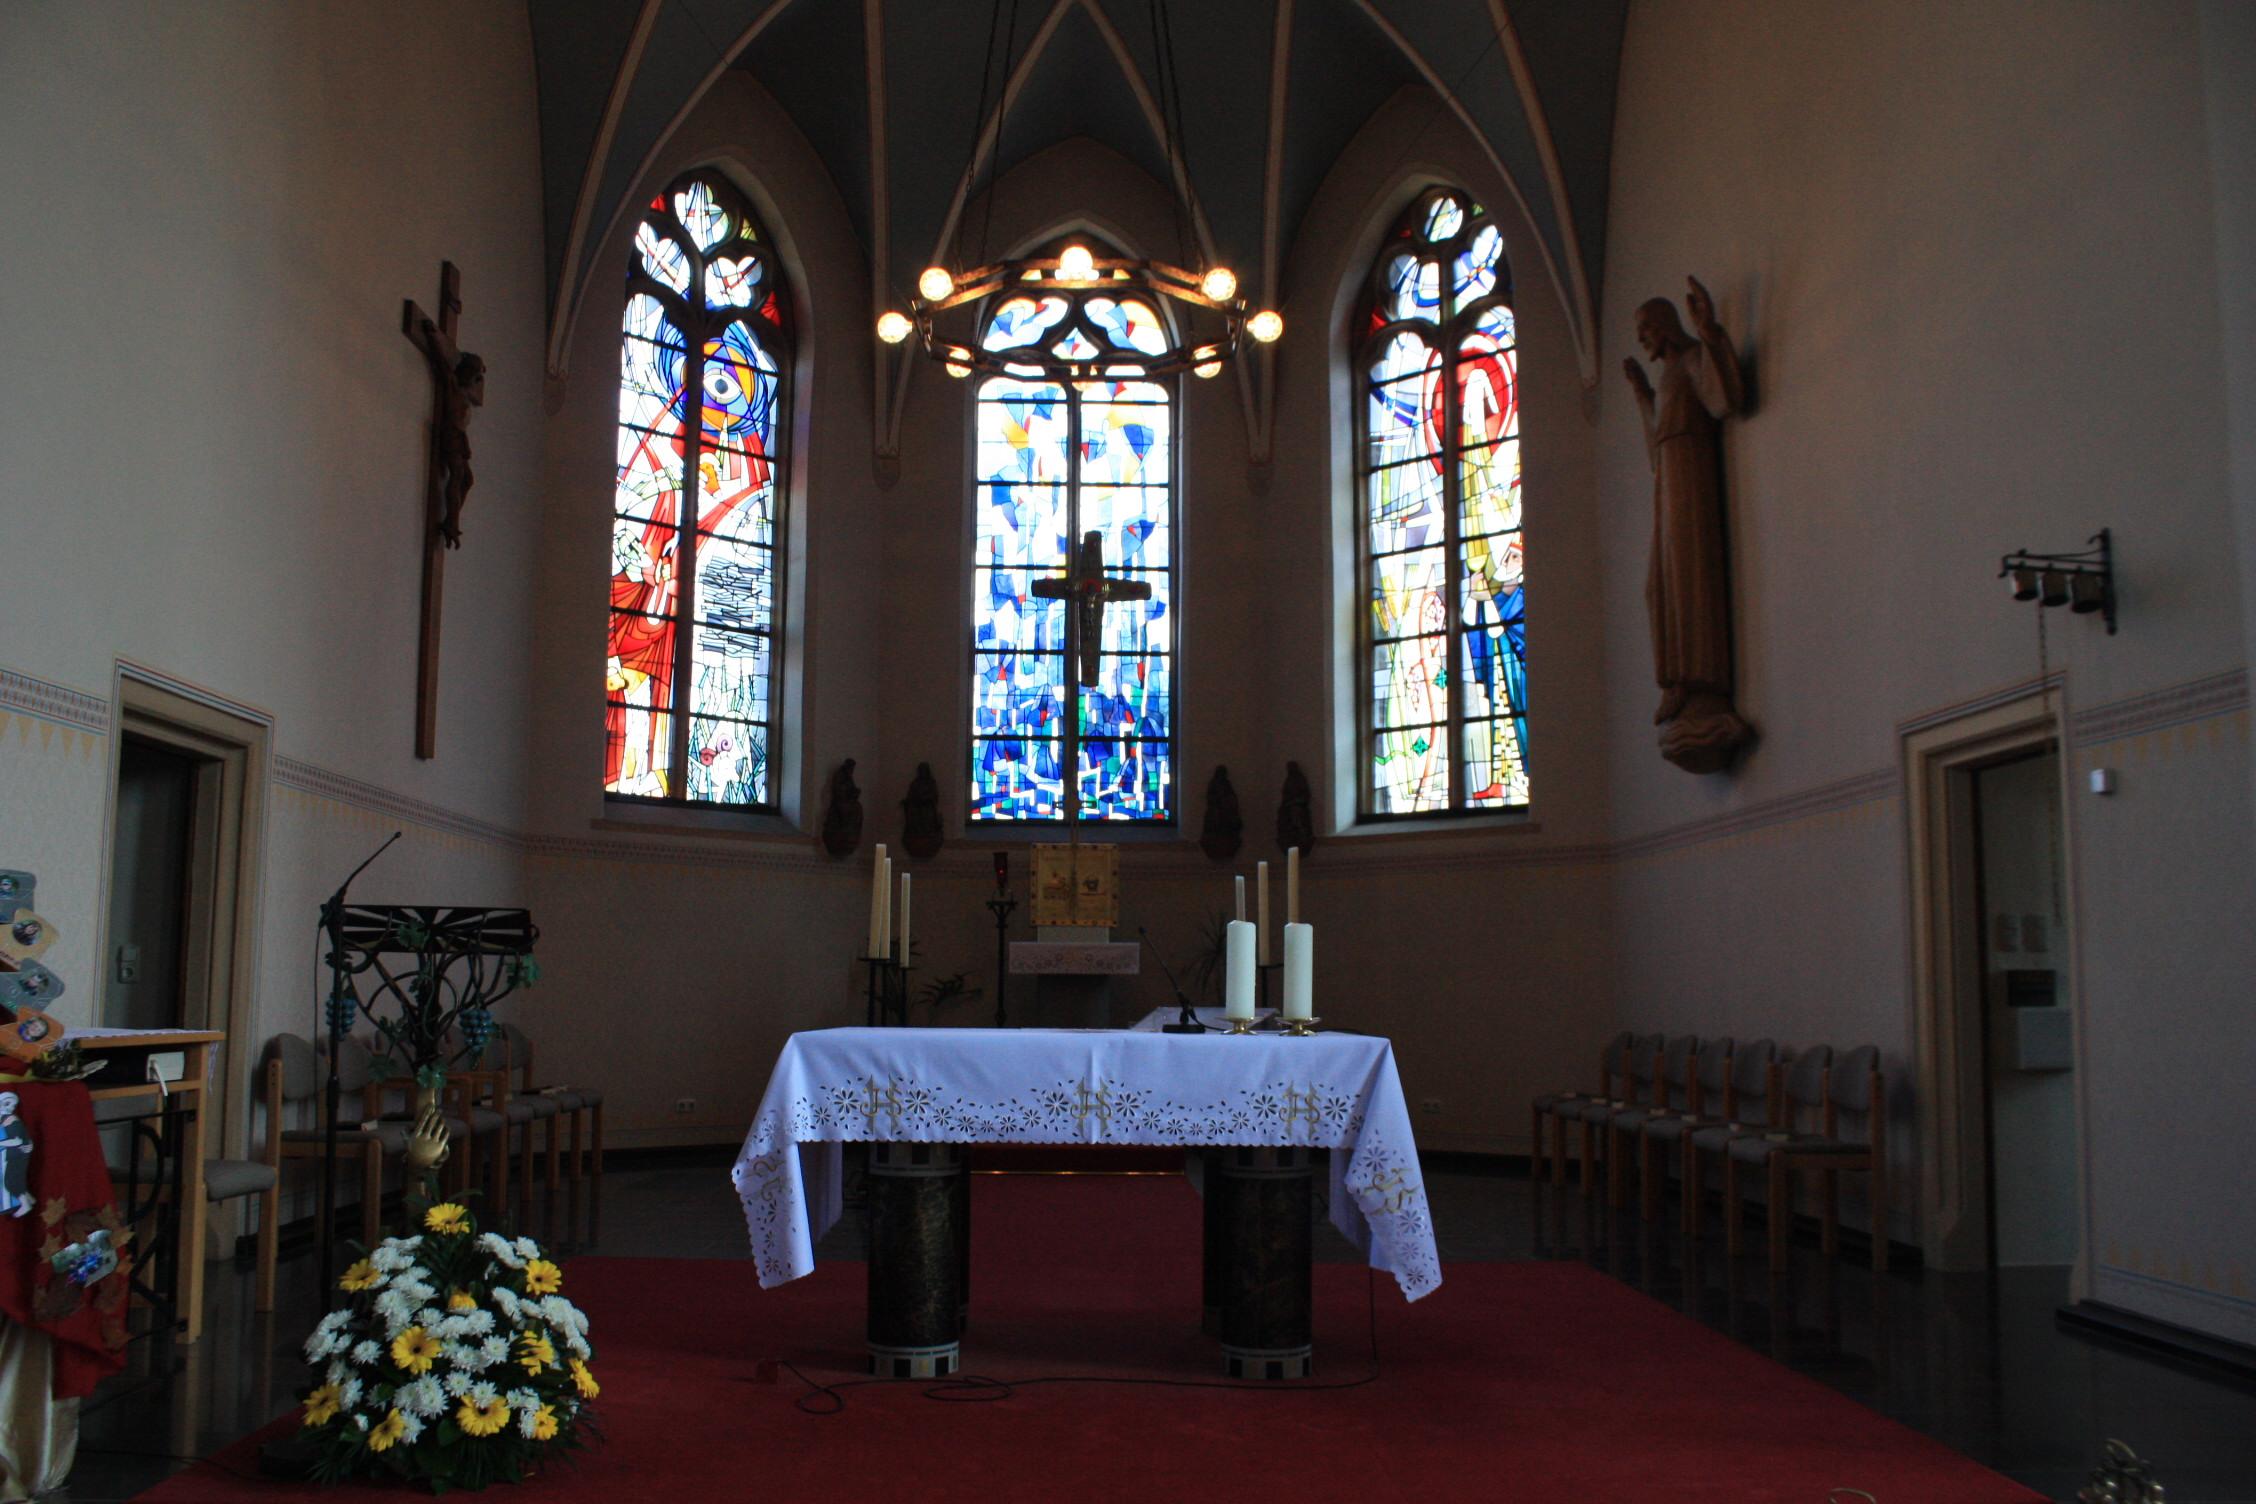 Pfarrfest in St. Martin Oberzier am 06. Mai 2018